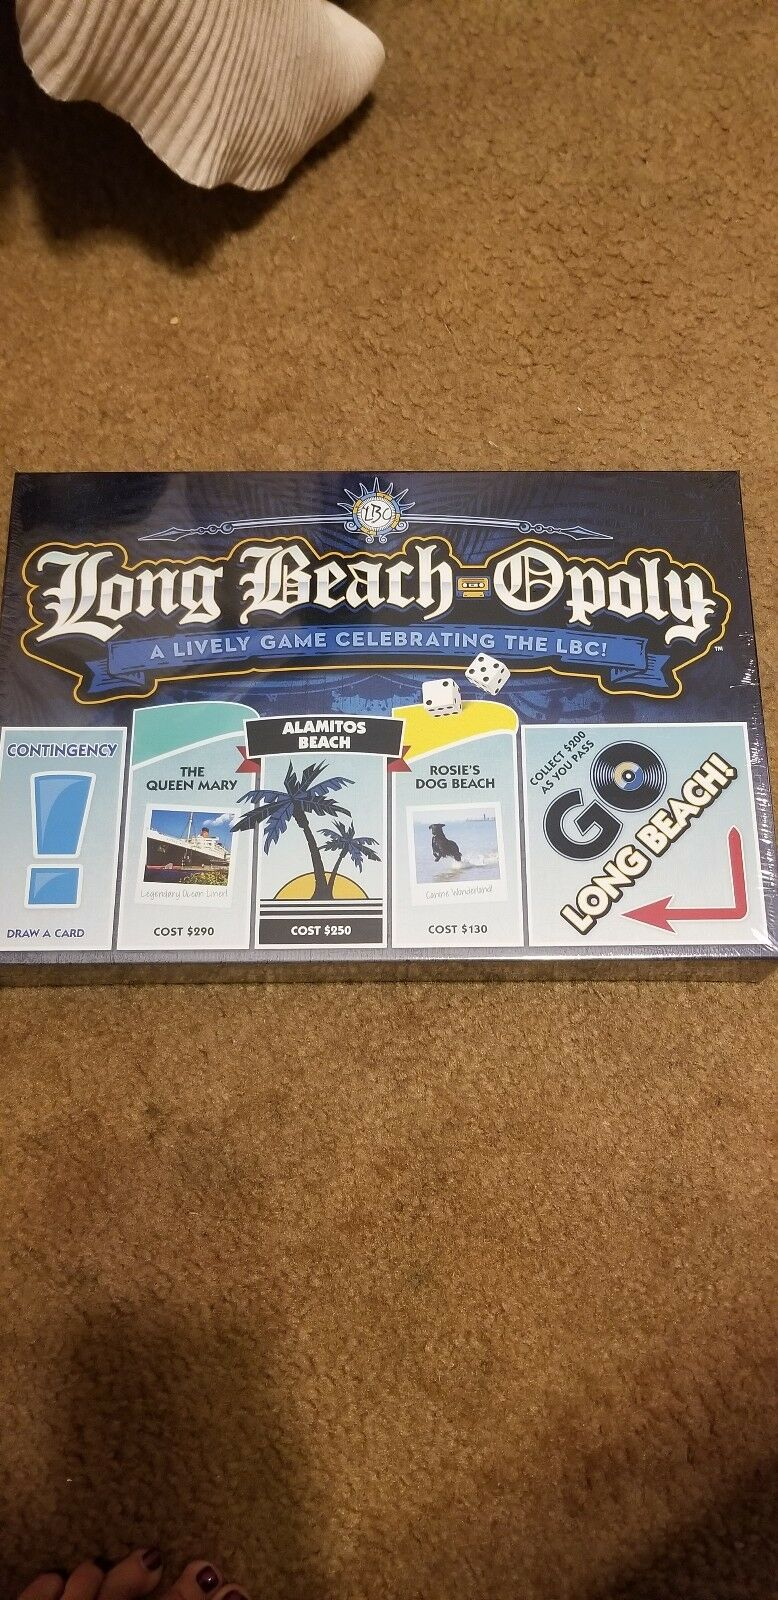 Long beach opoly exculize brettspiel